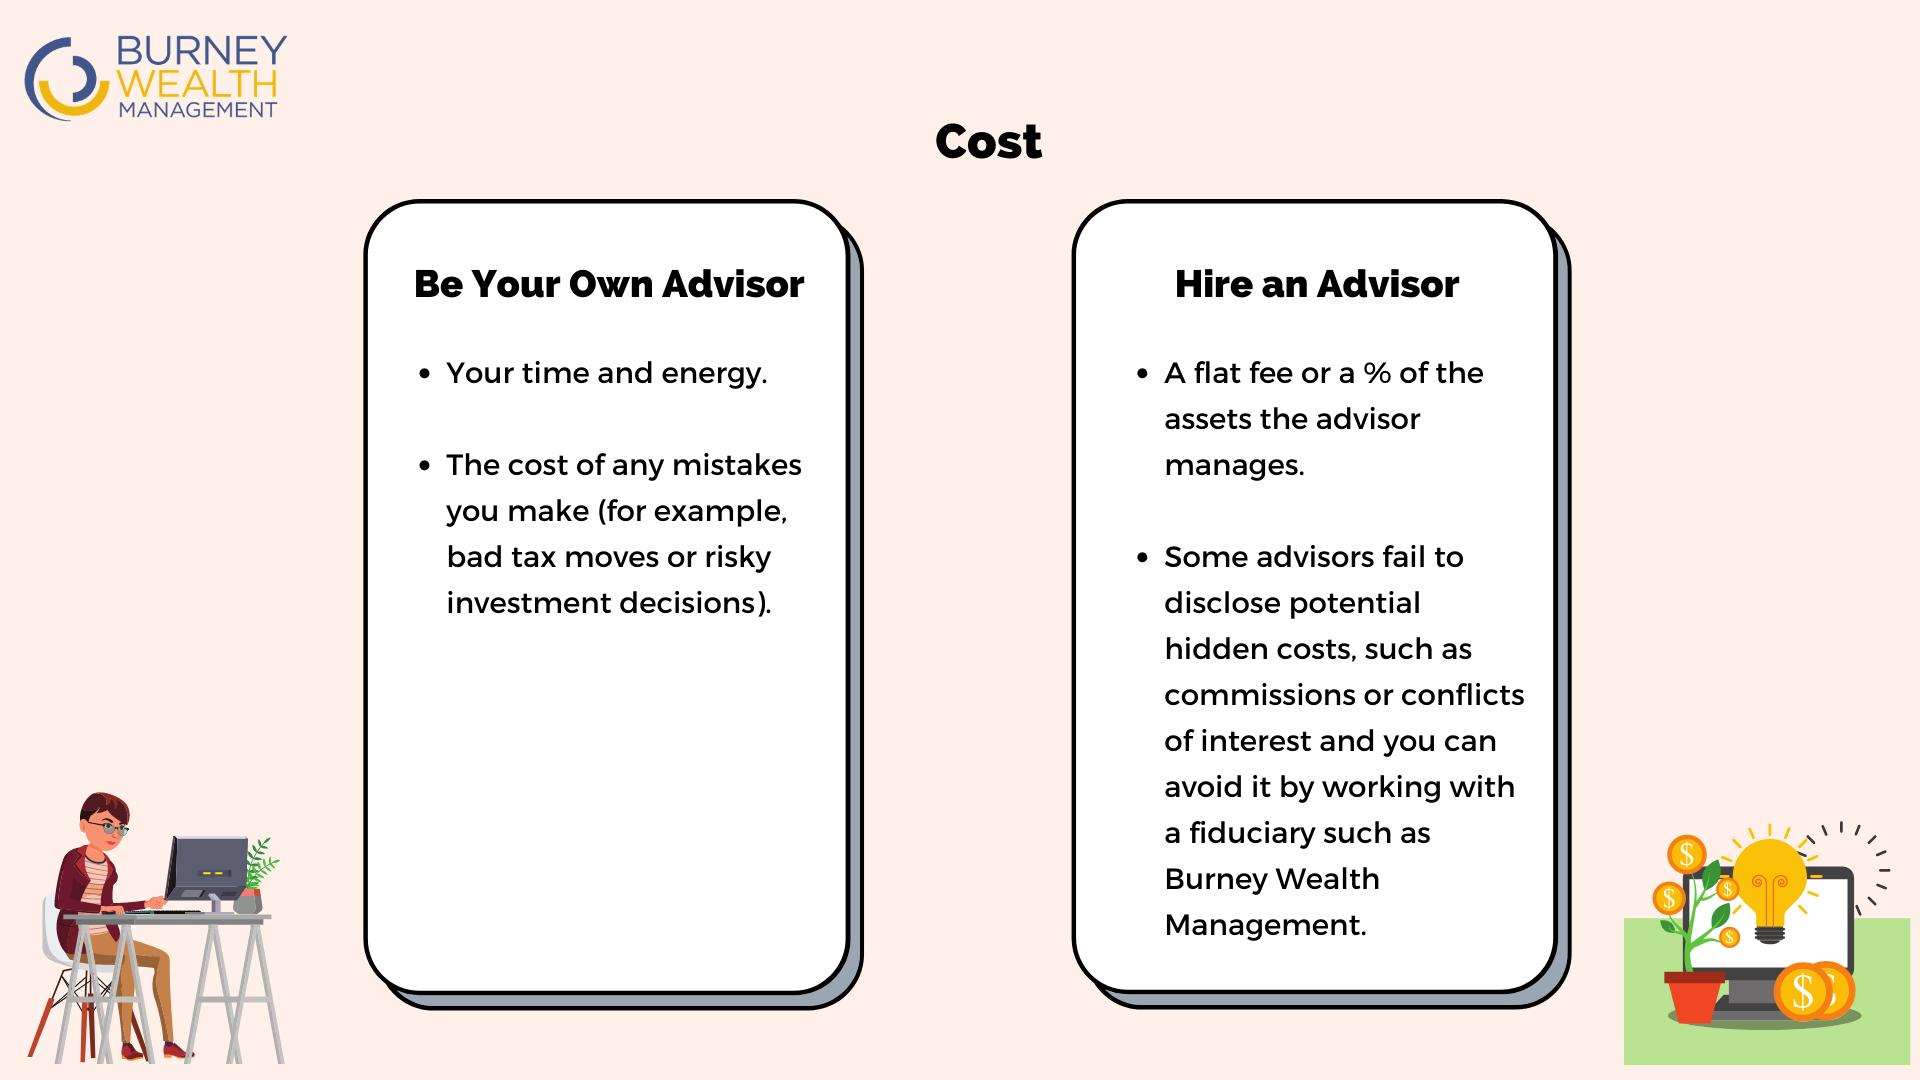 Cost of Hiring an advisor vs. being your own advisor